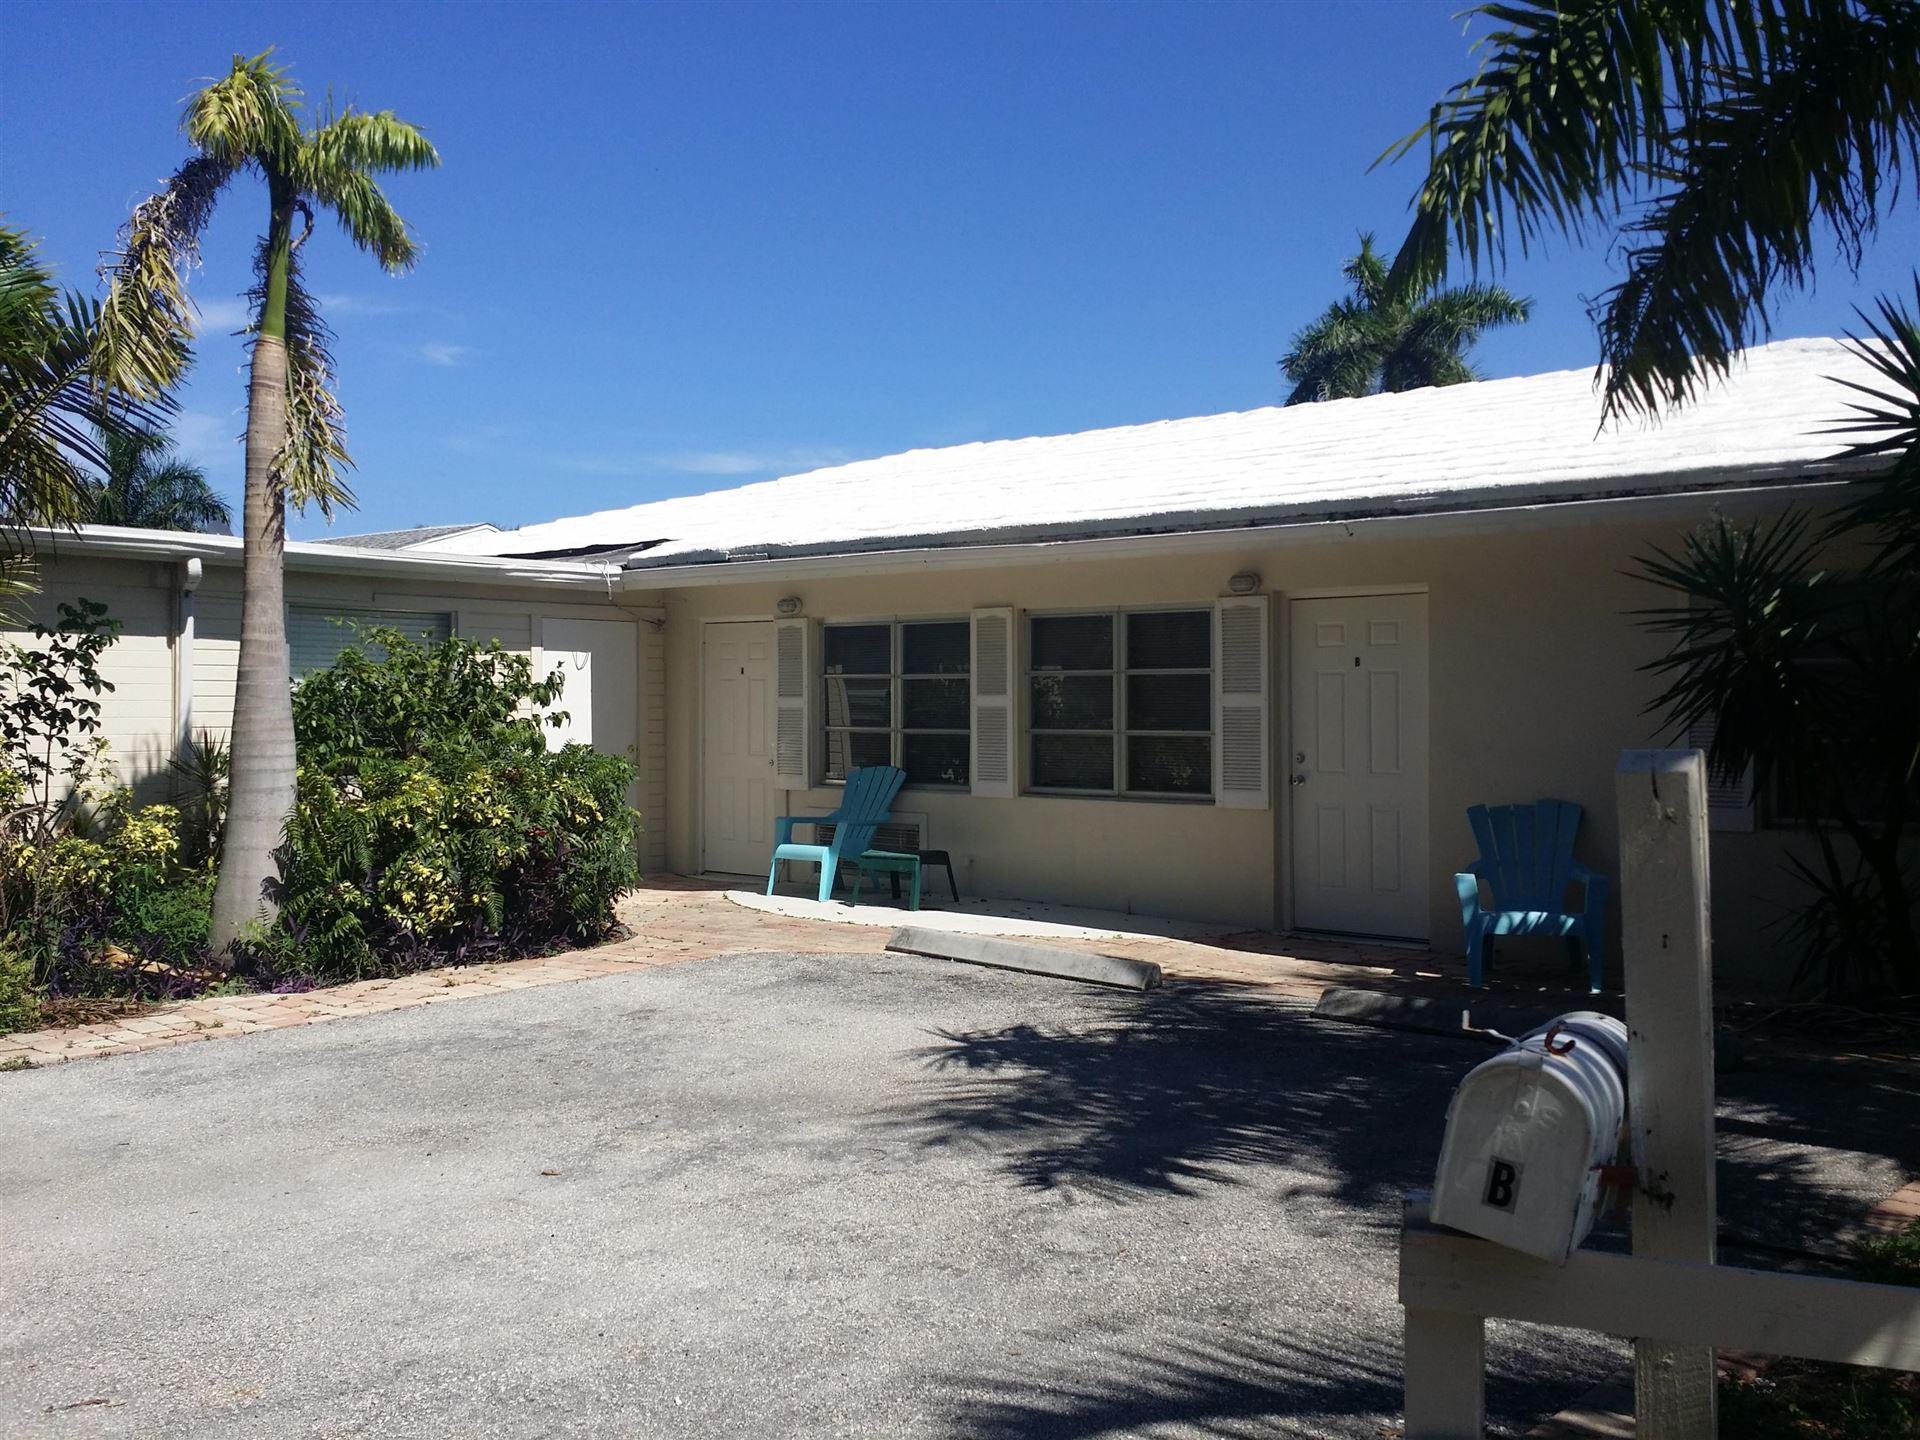 804 Bamboo Lane, Delray Beach, FL 33483 - #: RX-10648118